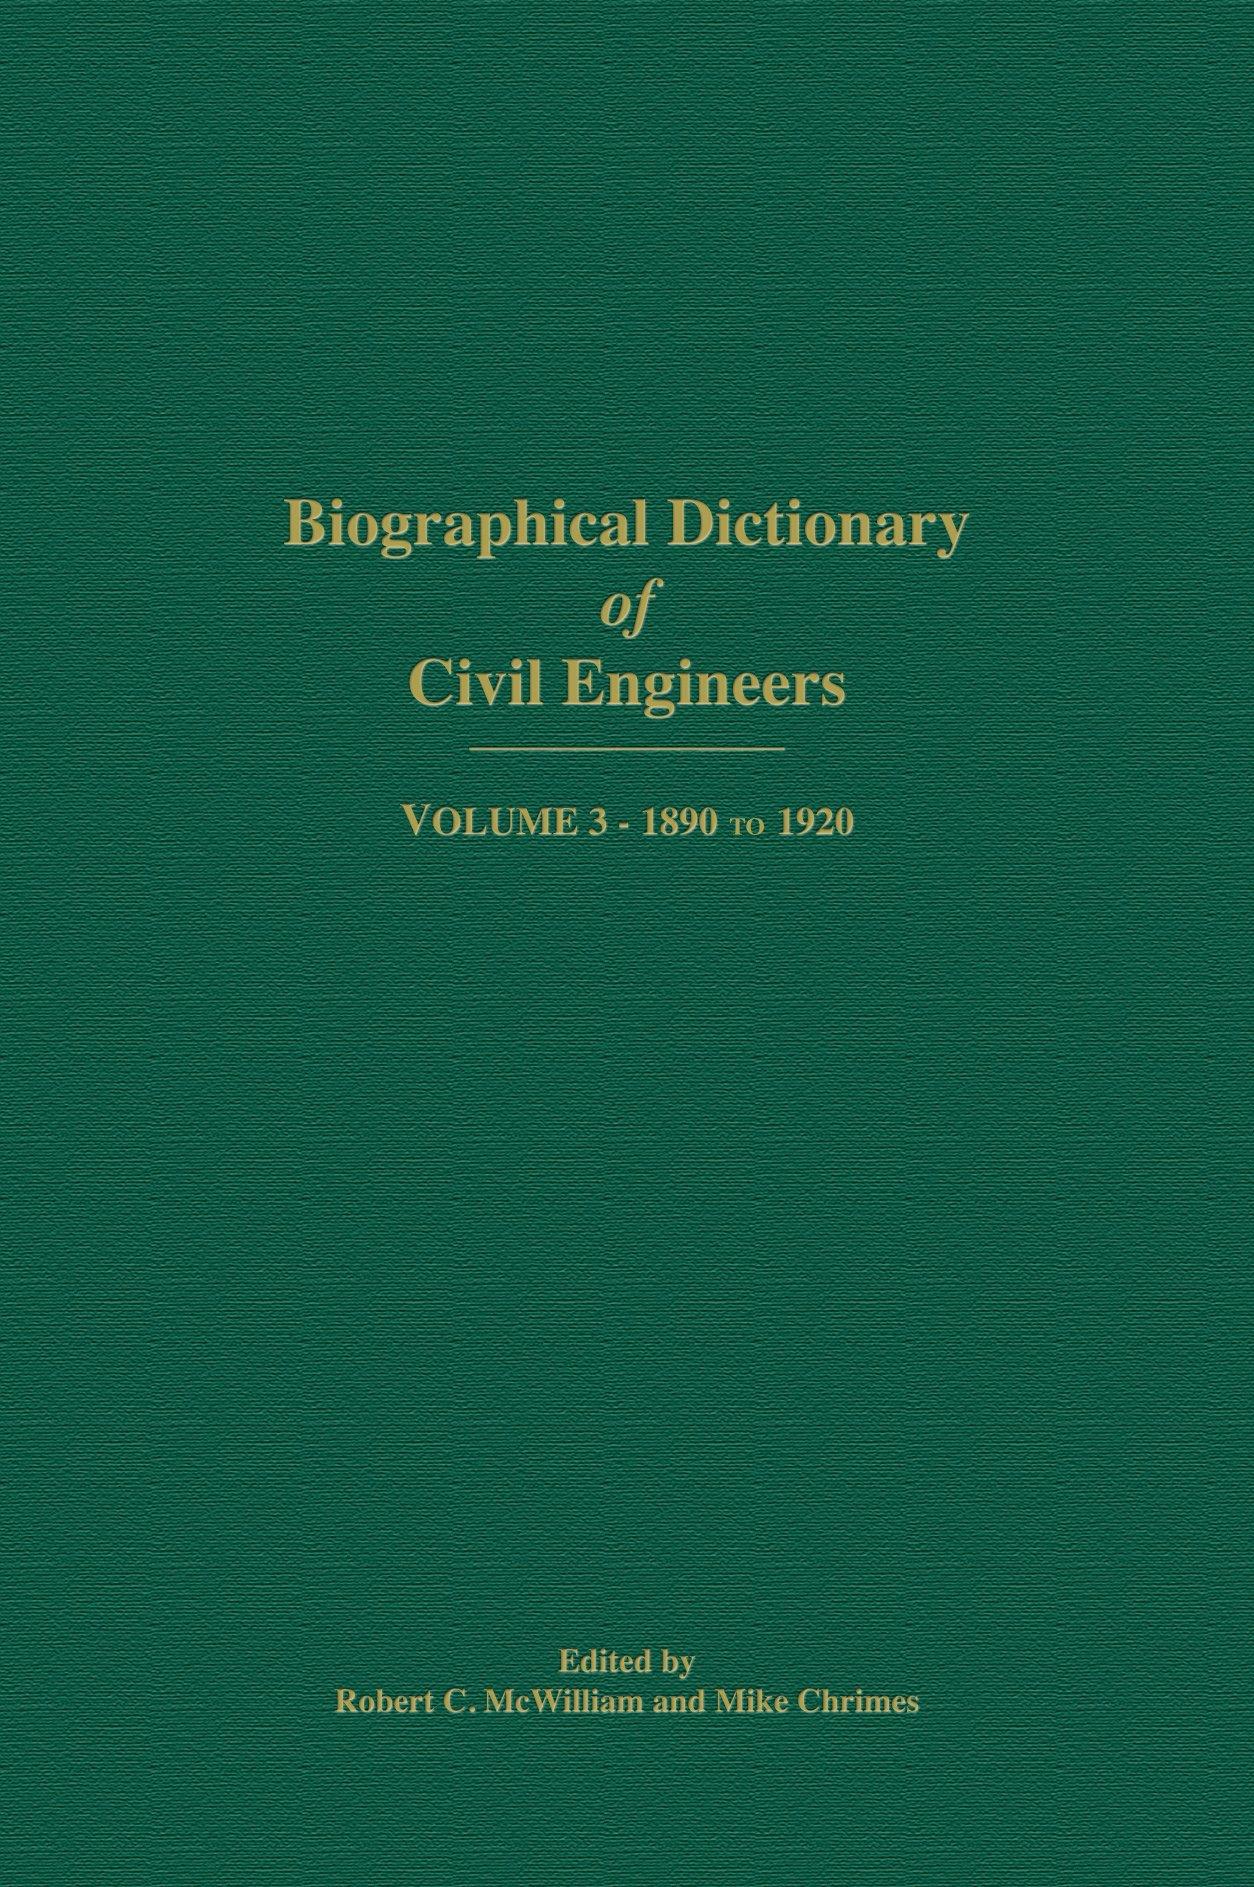 Biographical Dictionary of Railway Engineers